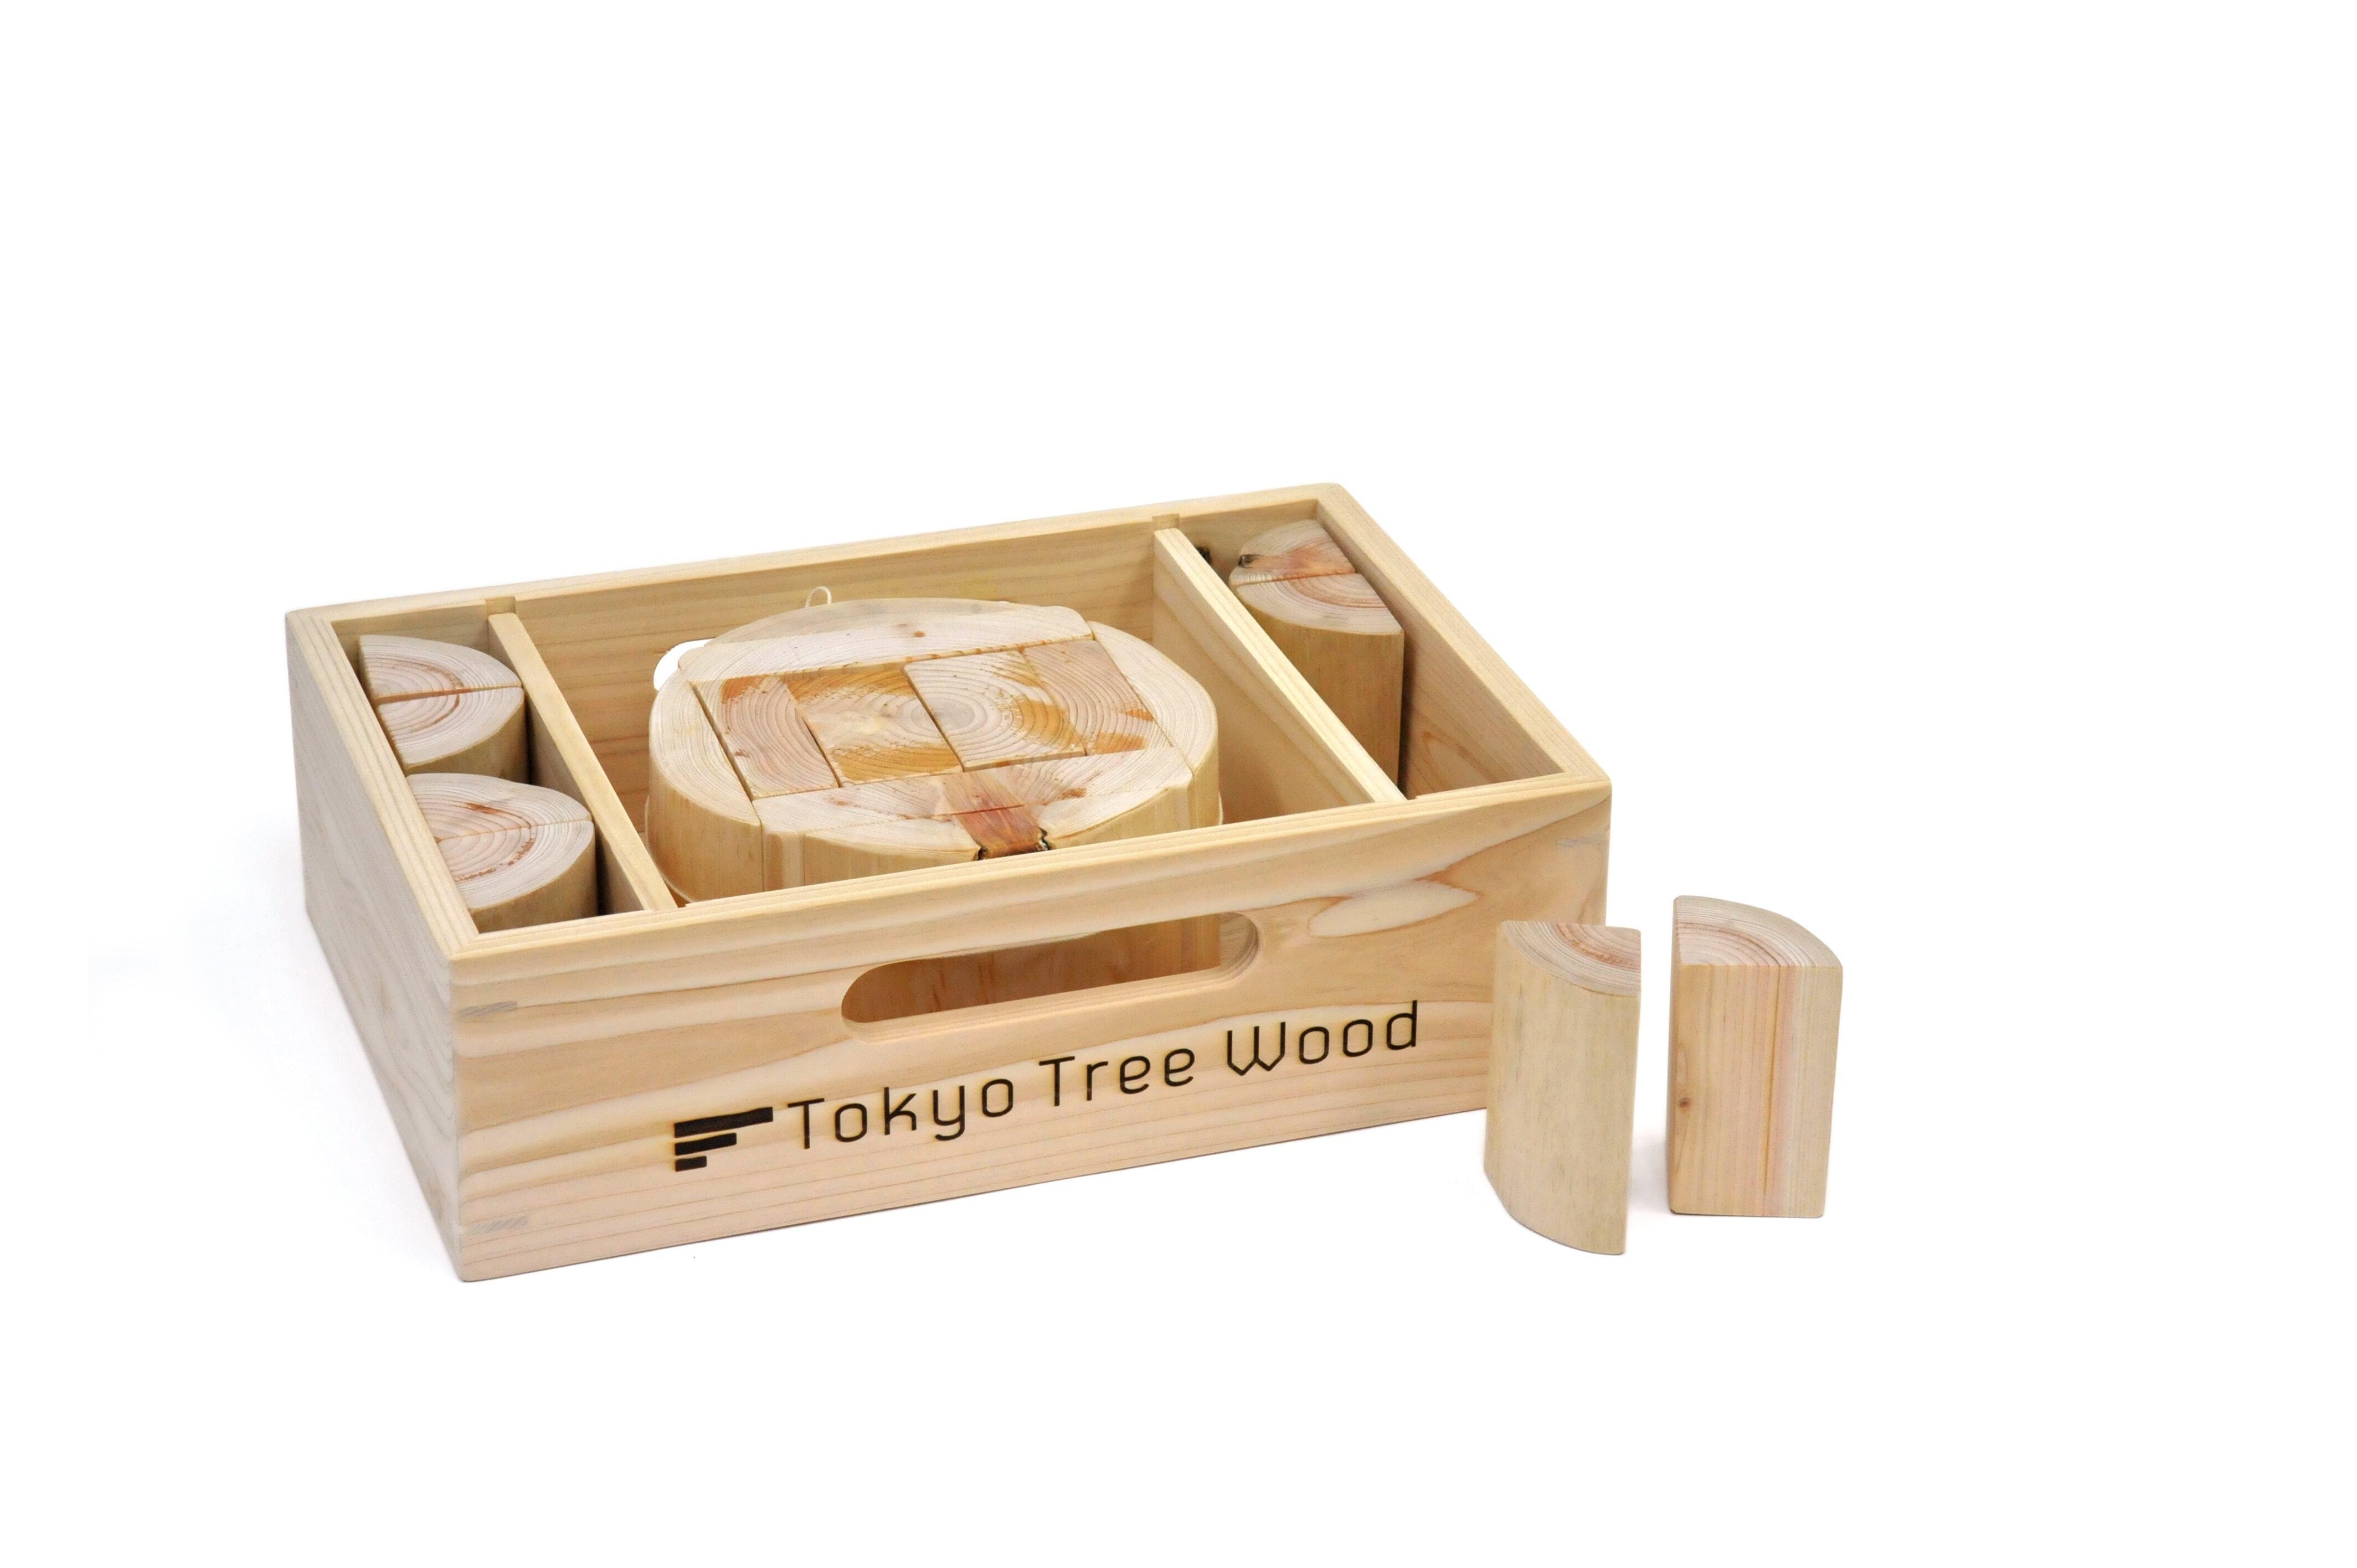 Tokyo Tree Wood 丸太の木取りつみき